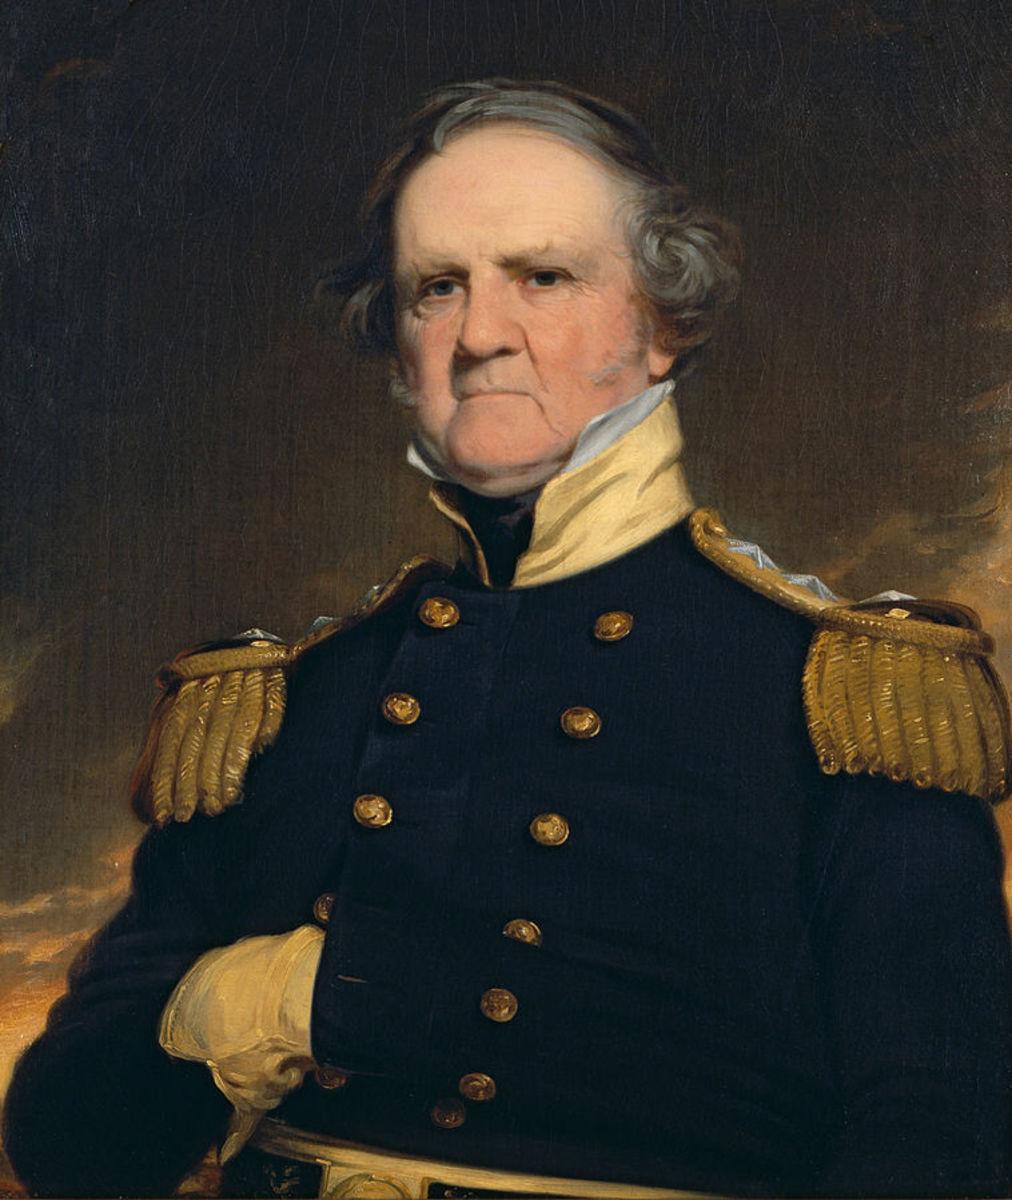 General Winfield Scott circa 1855.